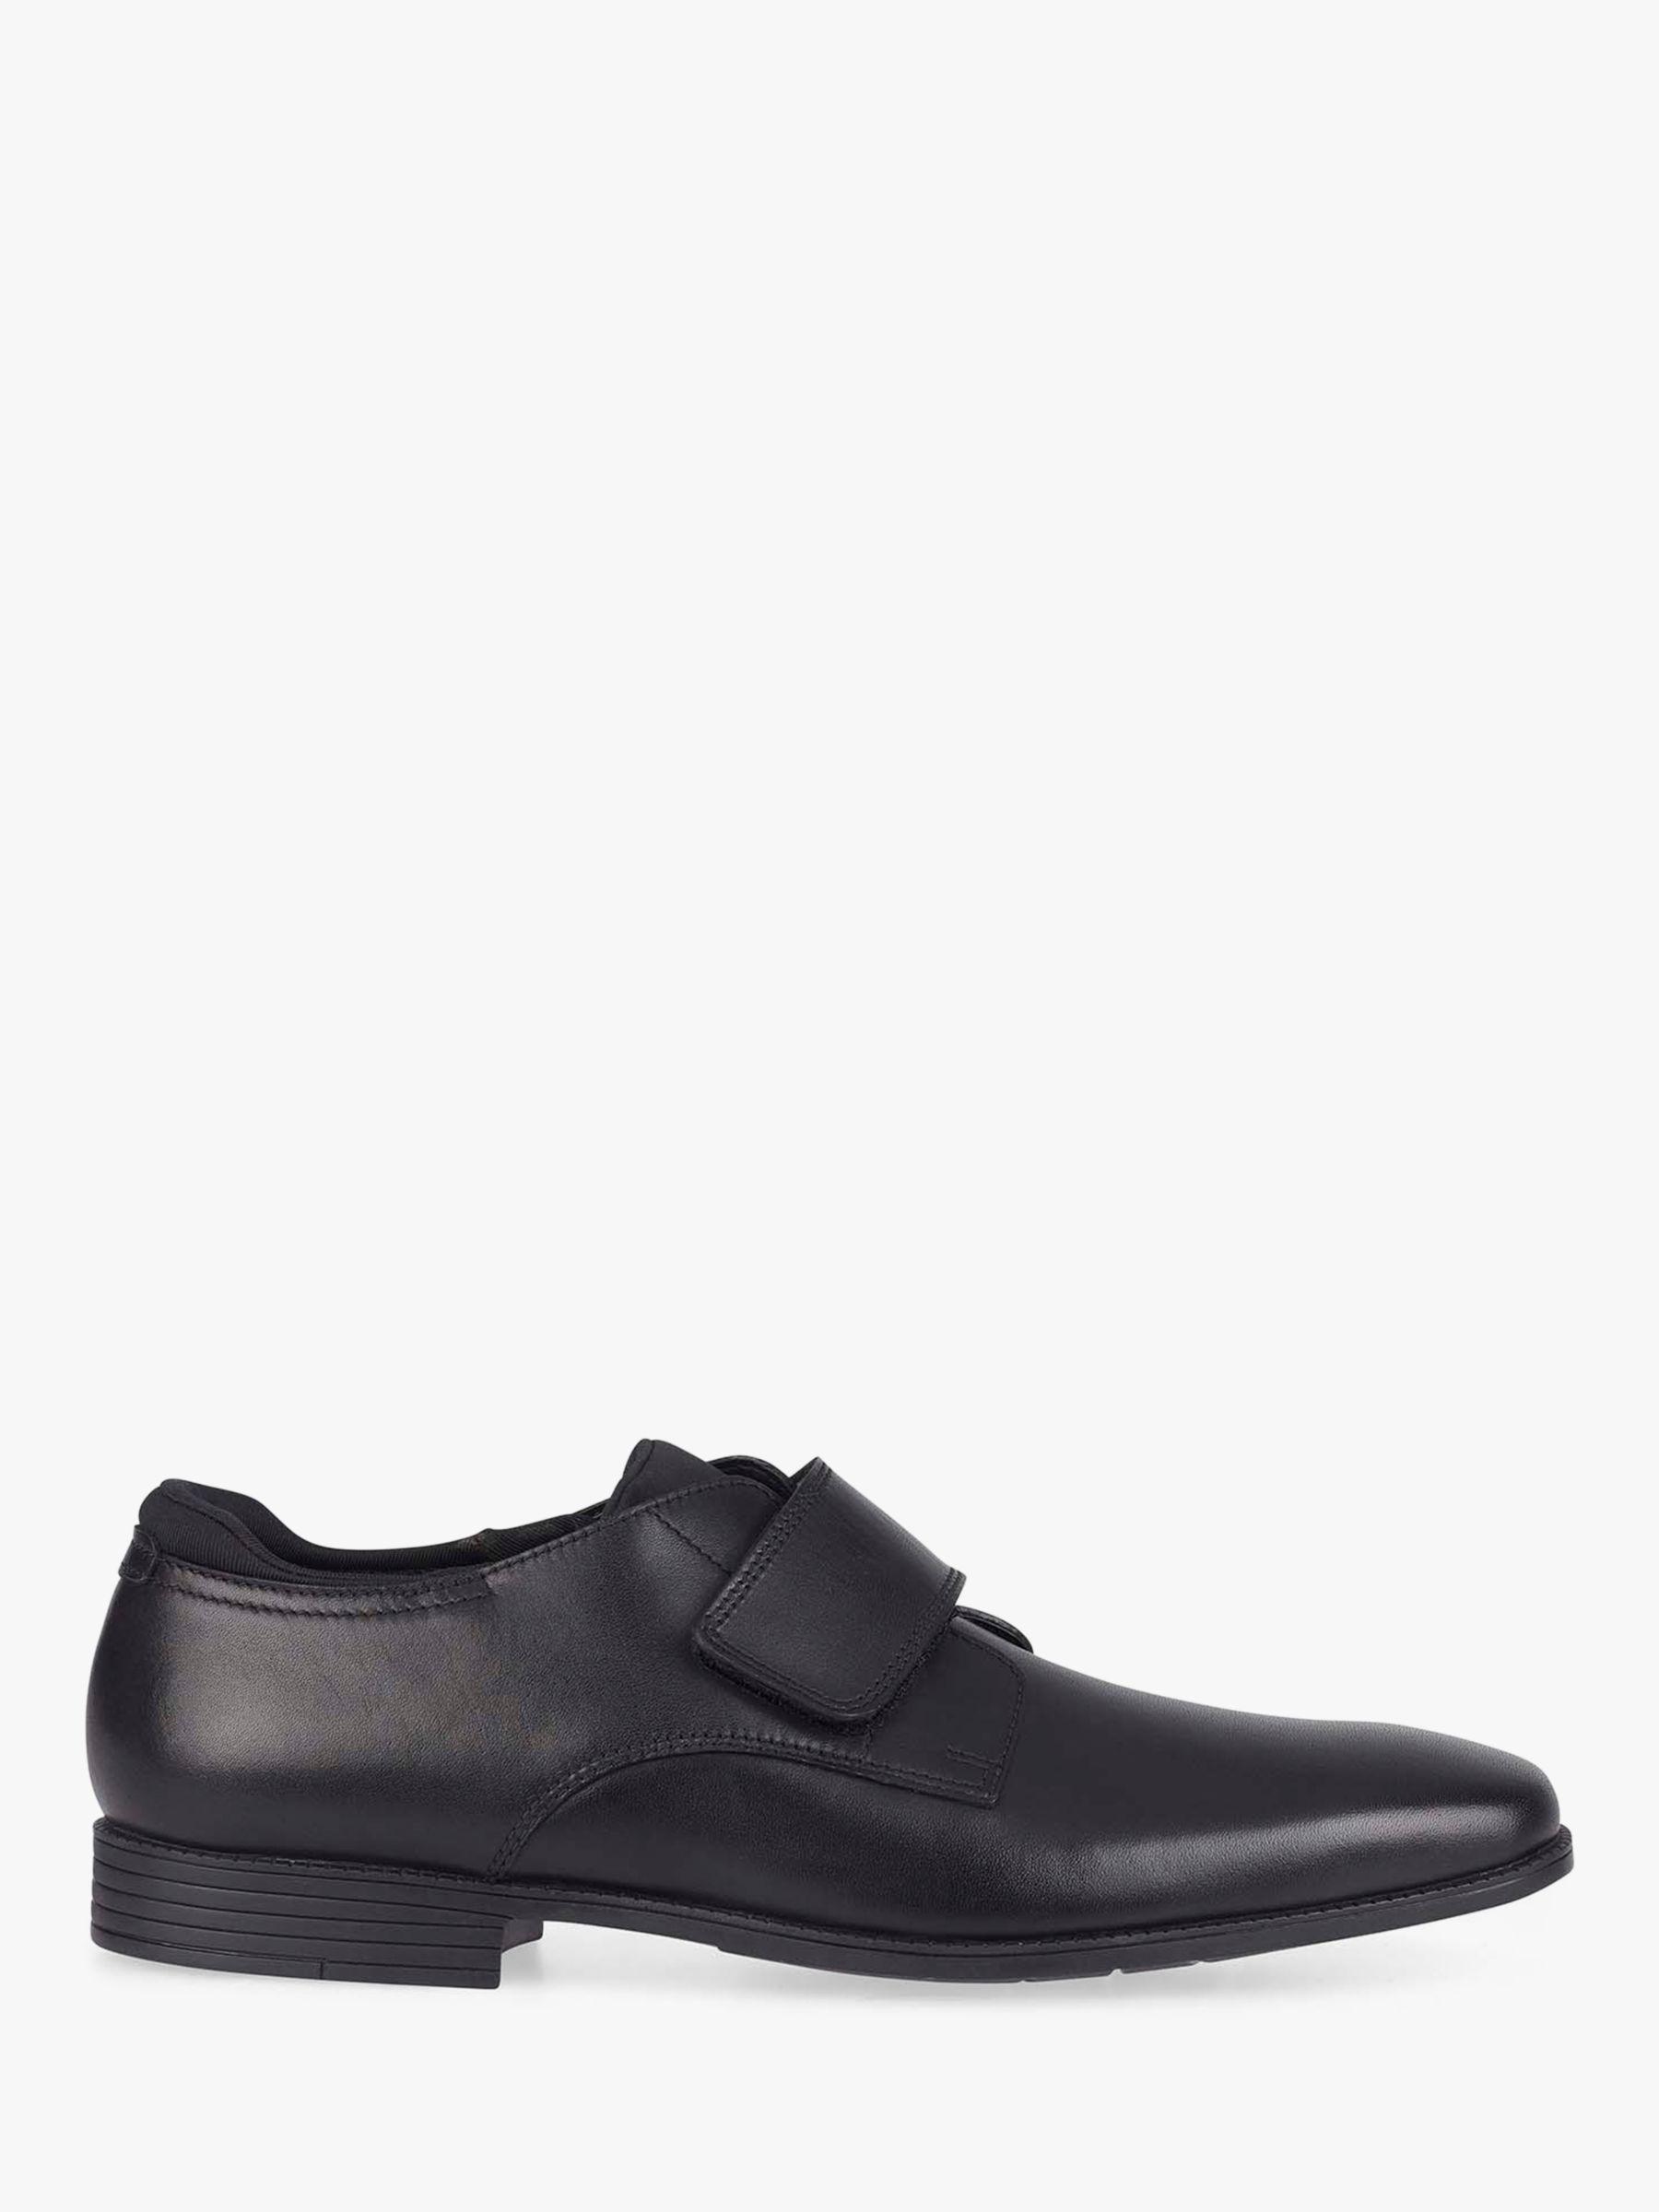 Start-Rite Start-rite Children's Logic Leather Shoes, Black